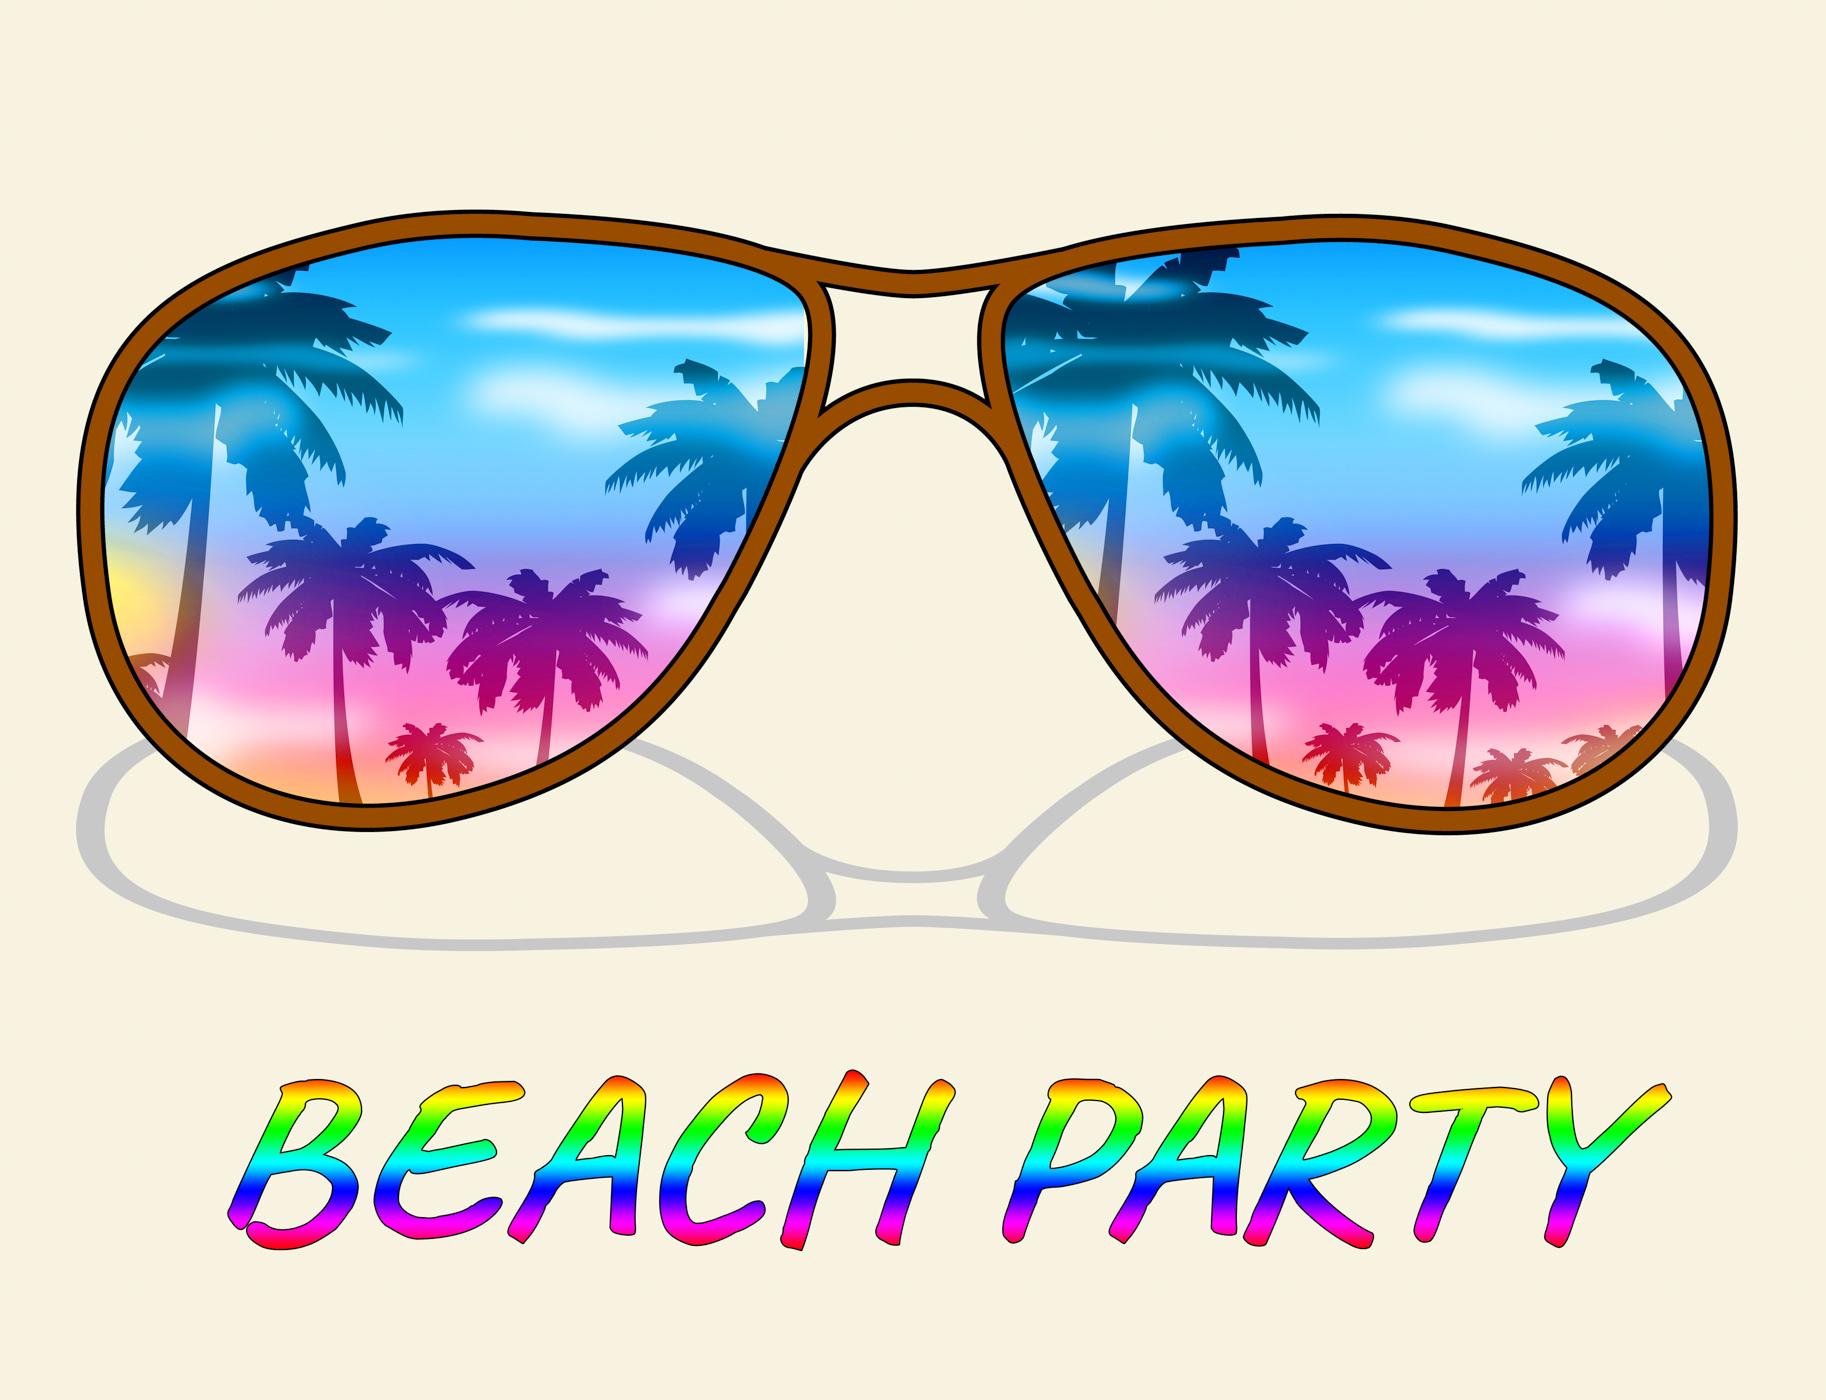 Beach Party Indicates Ocean Parties And Fun, Beach, Ocean, Vacation, Tropical, HQ Photo